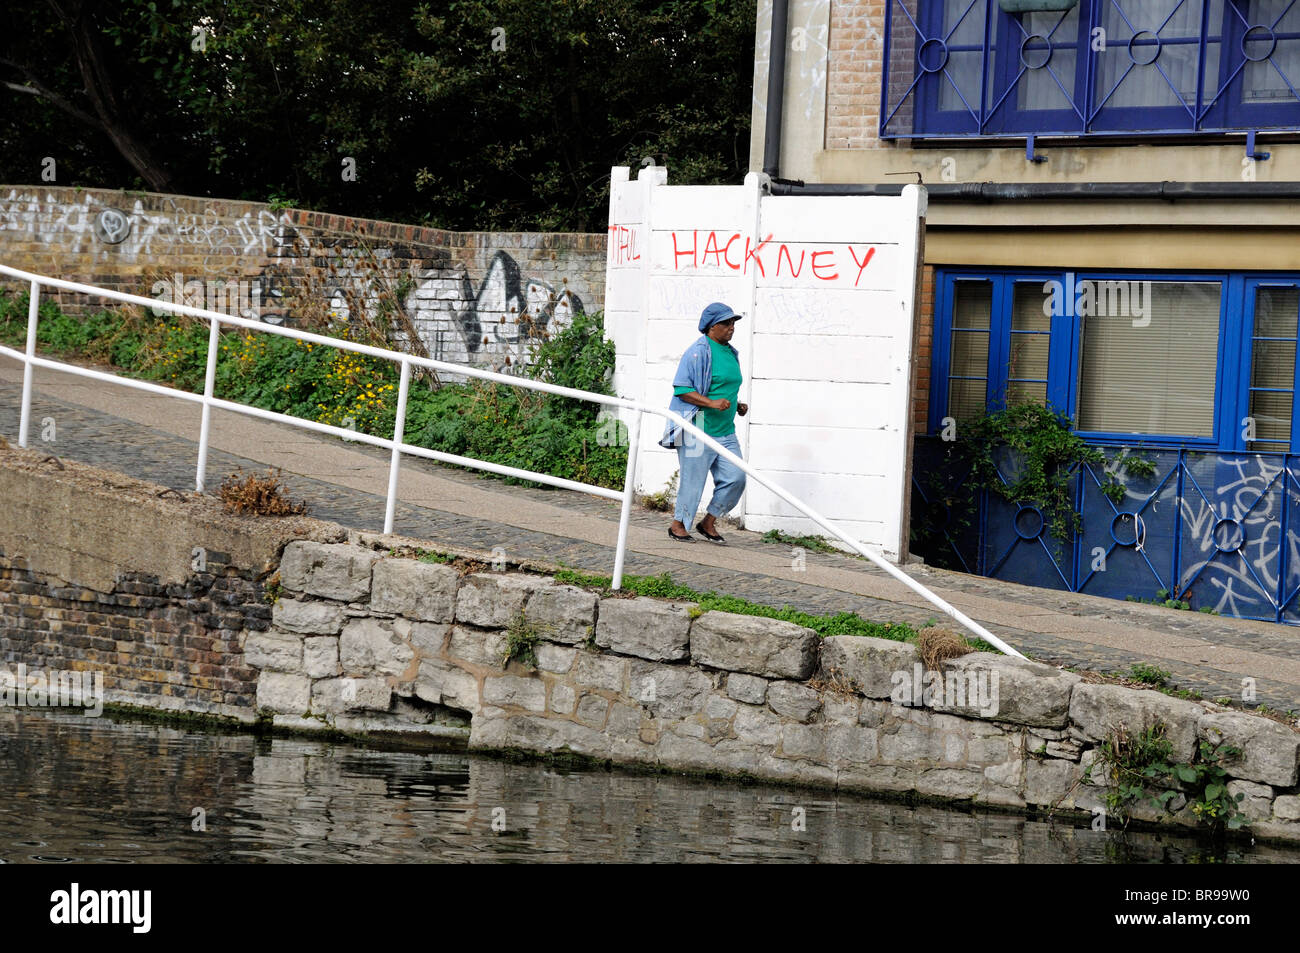 Lady jogging on Regent's Canal Towpath Hackney London England UK - Stock Image